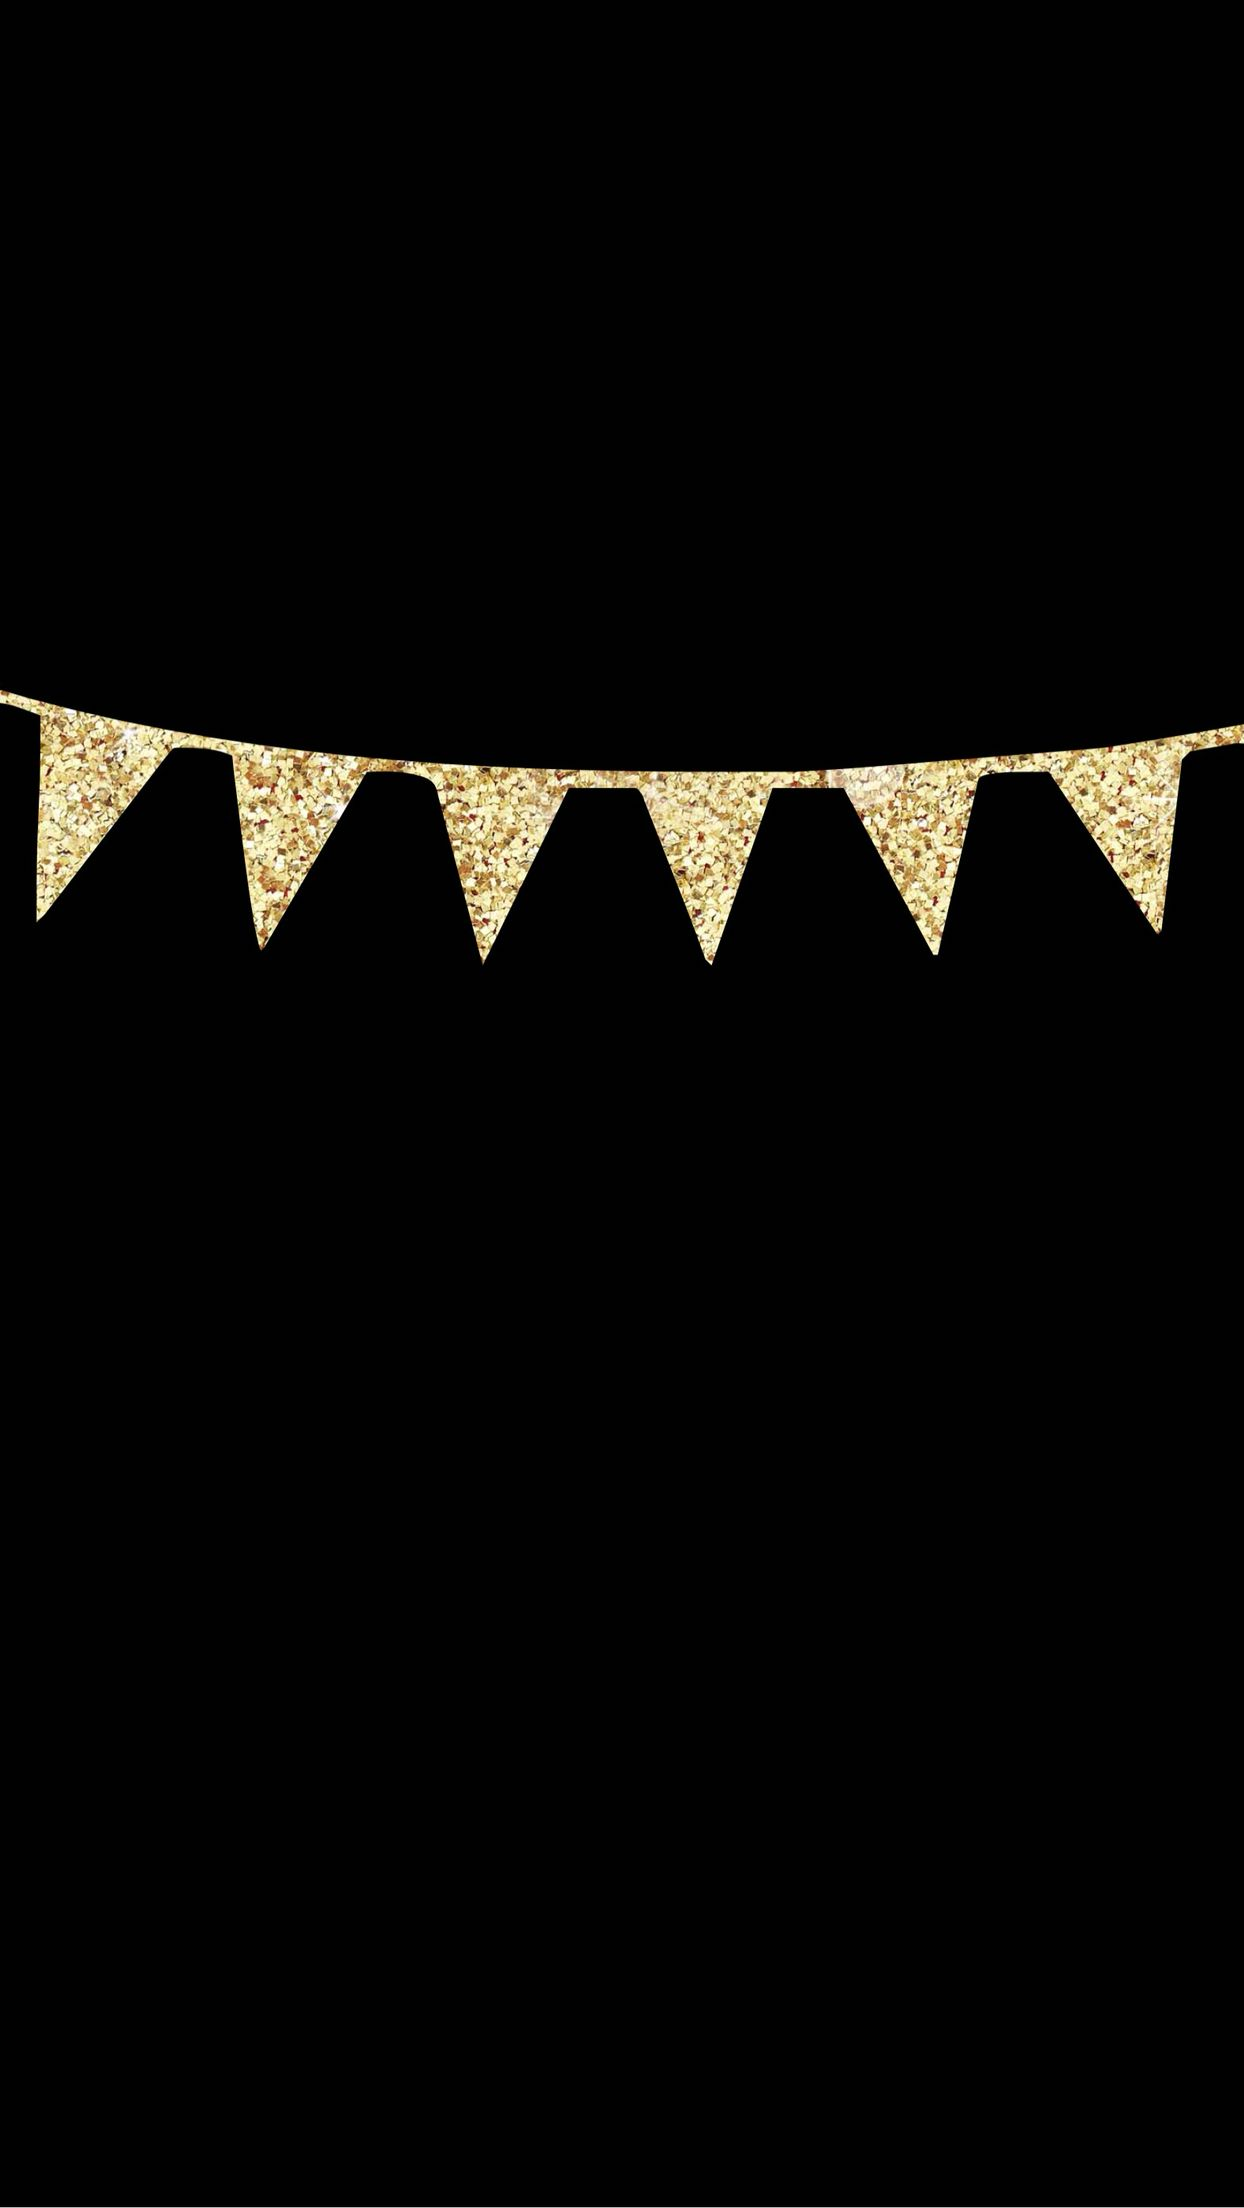 Iphone 6 Plus Lock Screen Wallpaper Black With Gold Glitter Gold Sparkle Wallpaper Lock Screen Wallpaper Sparkle Wallpaper